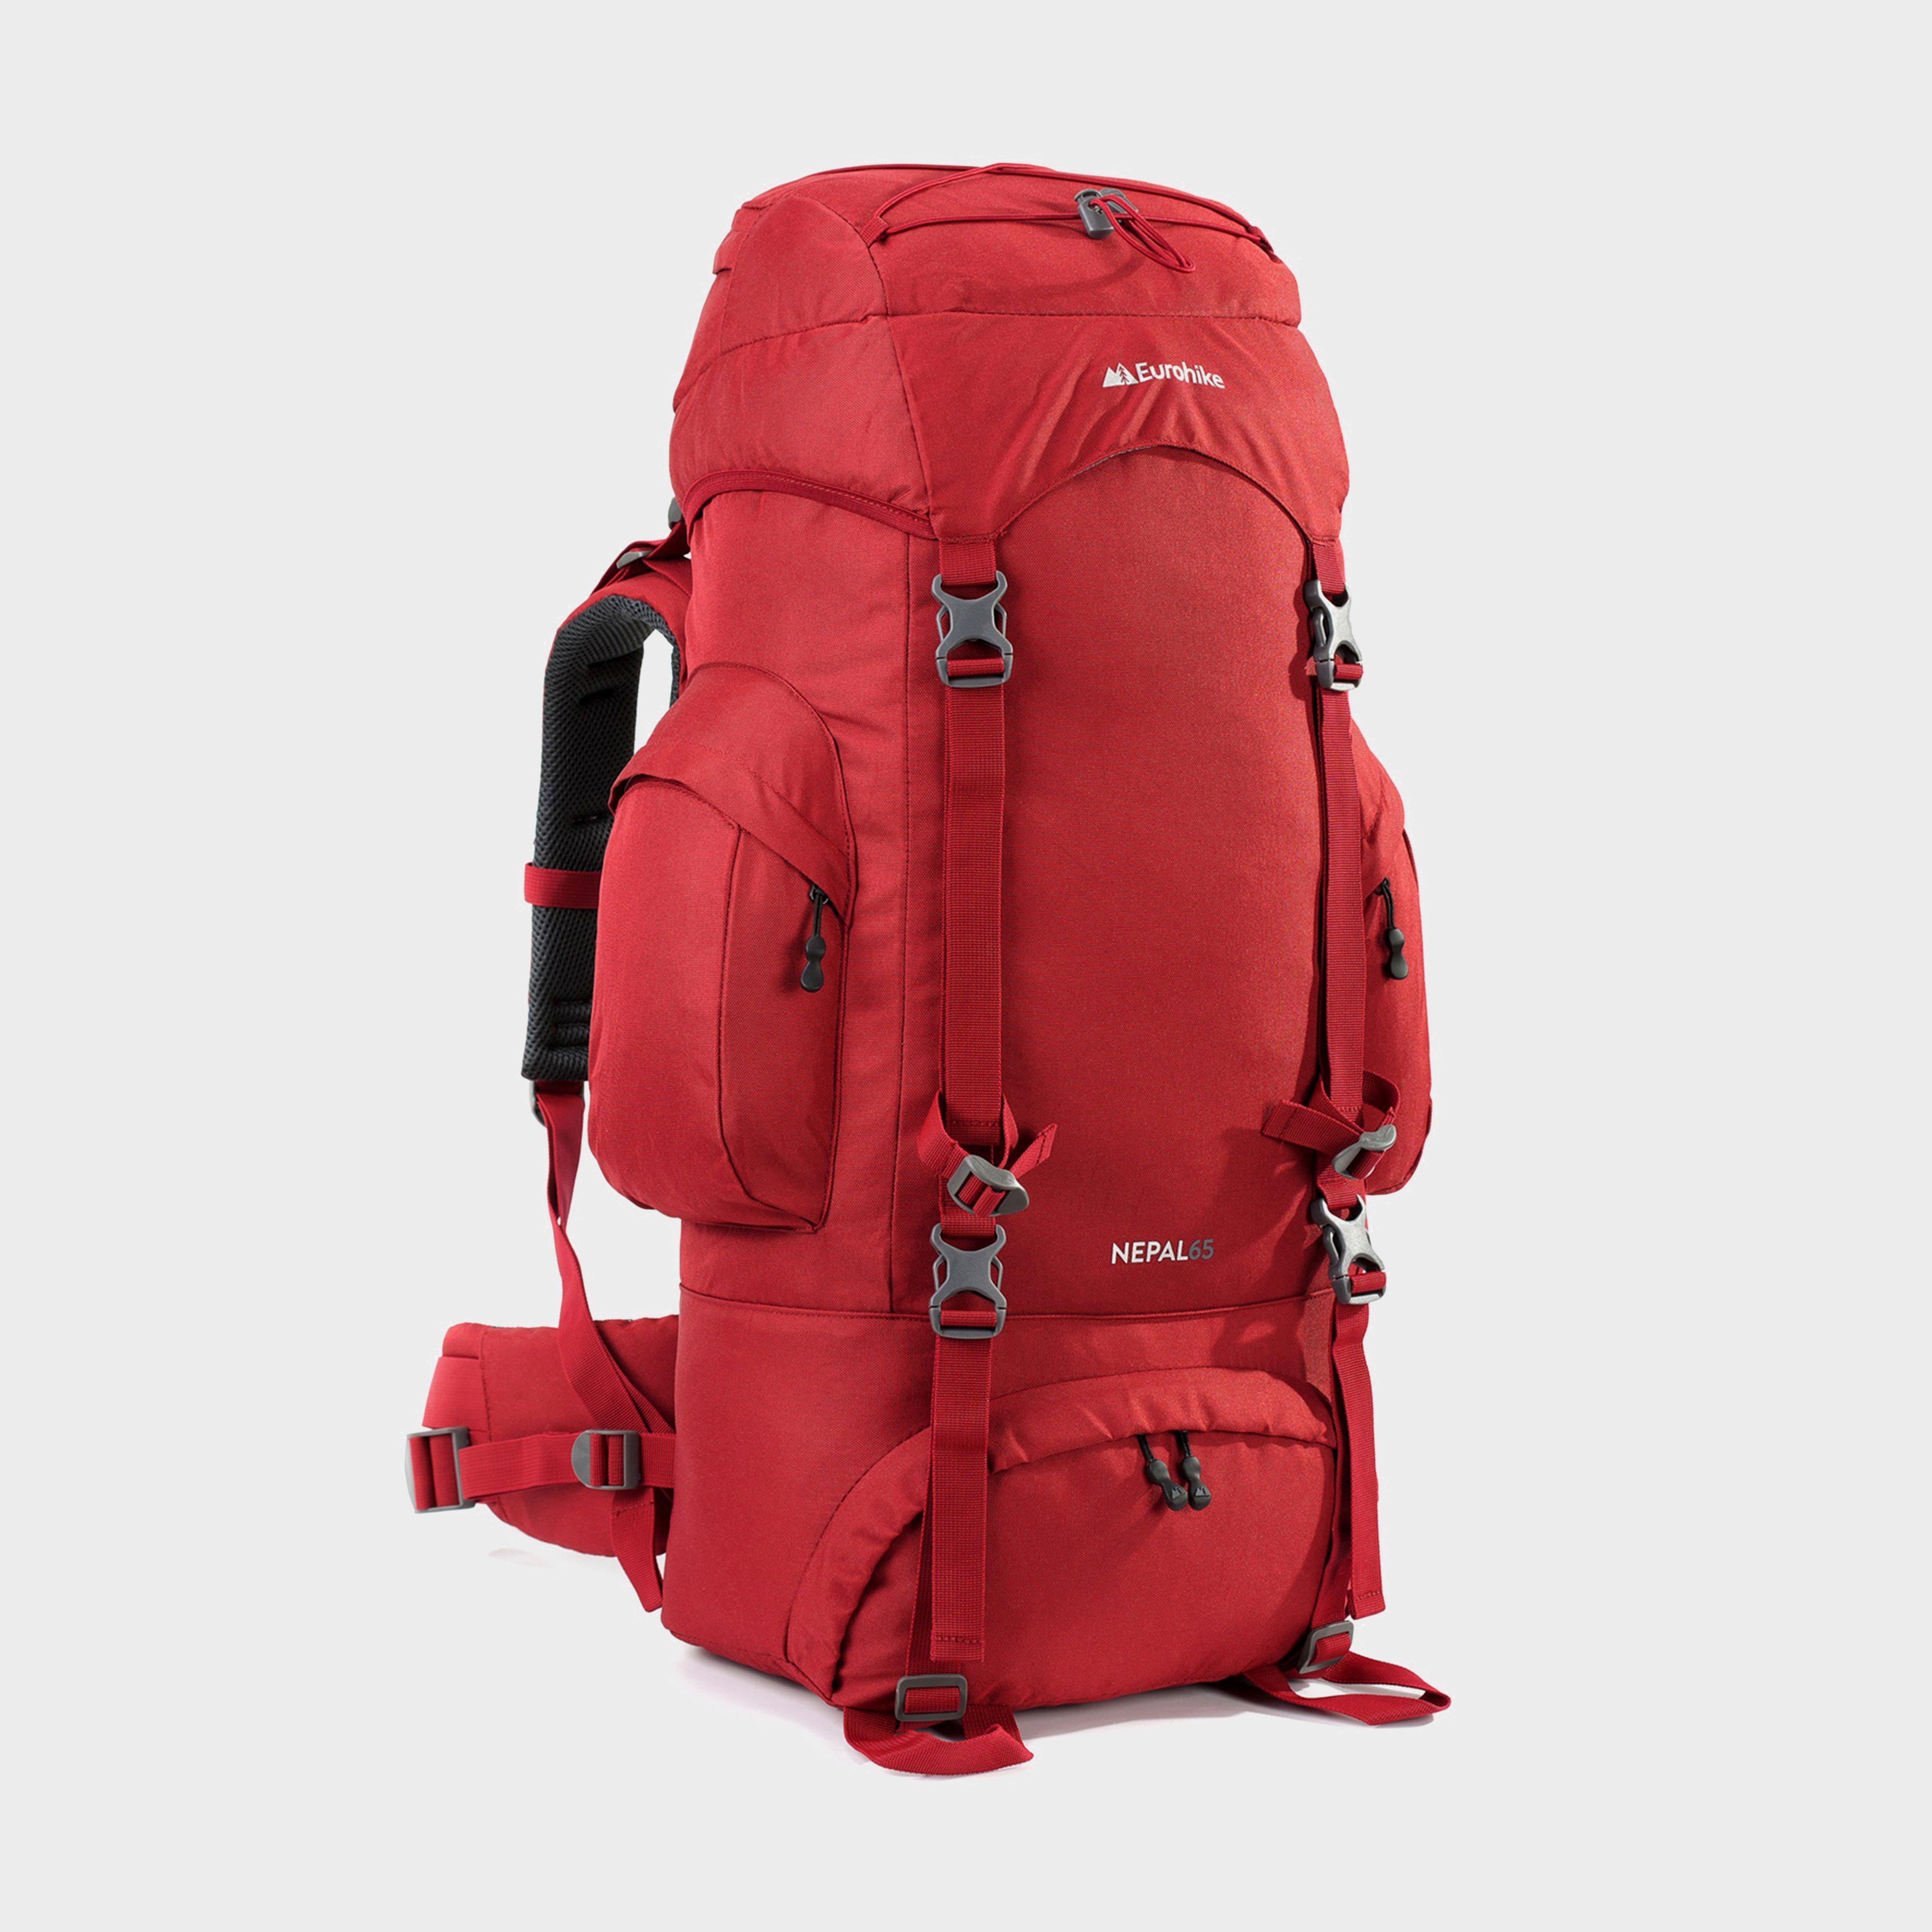 Eurohike Eurohike Nepal 65 Rucksack, Red